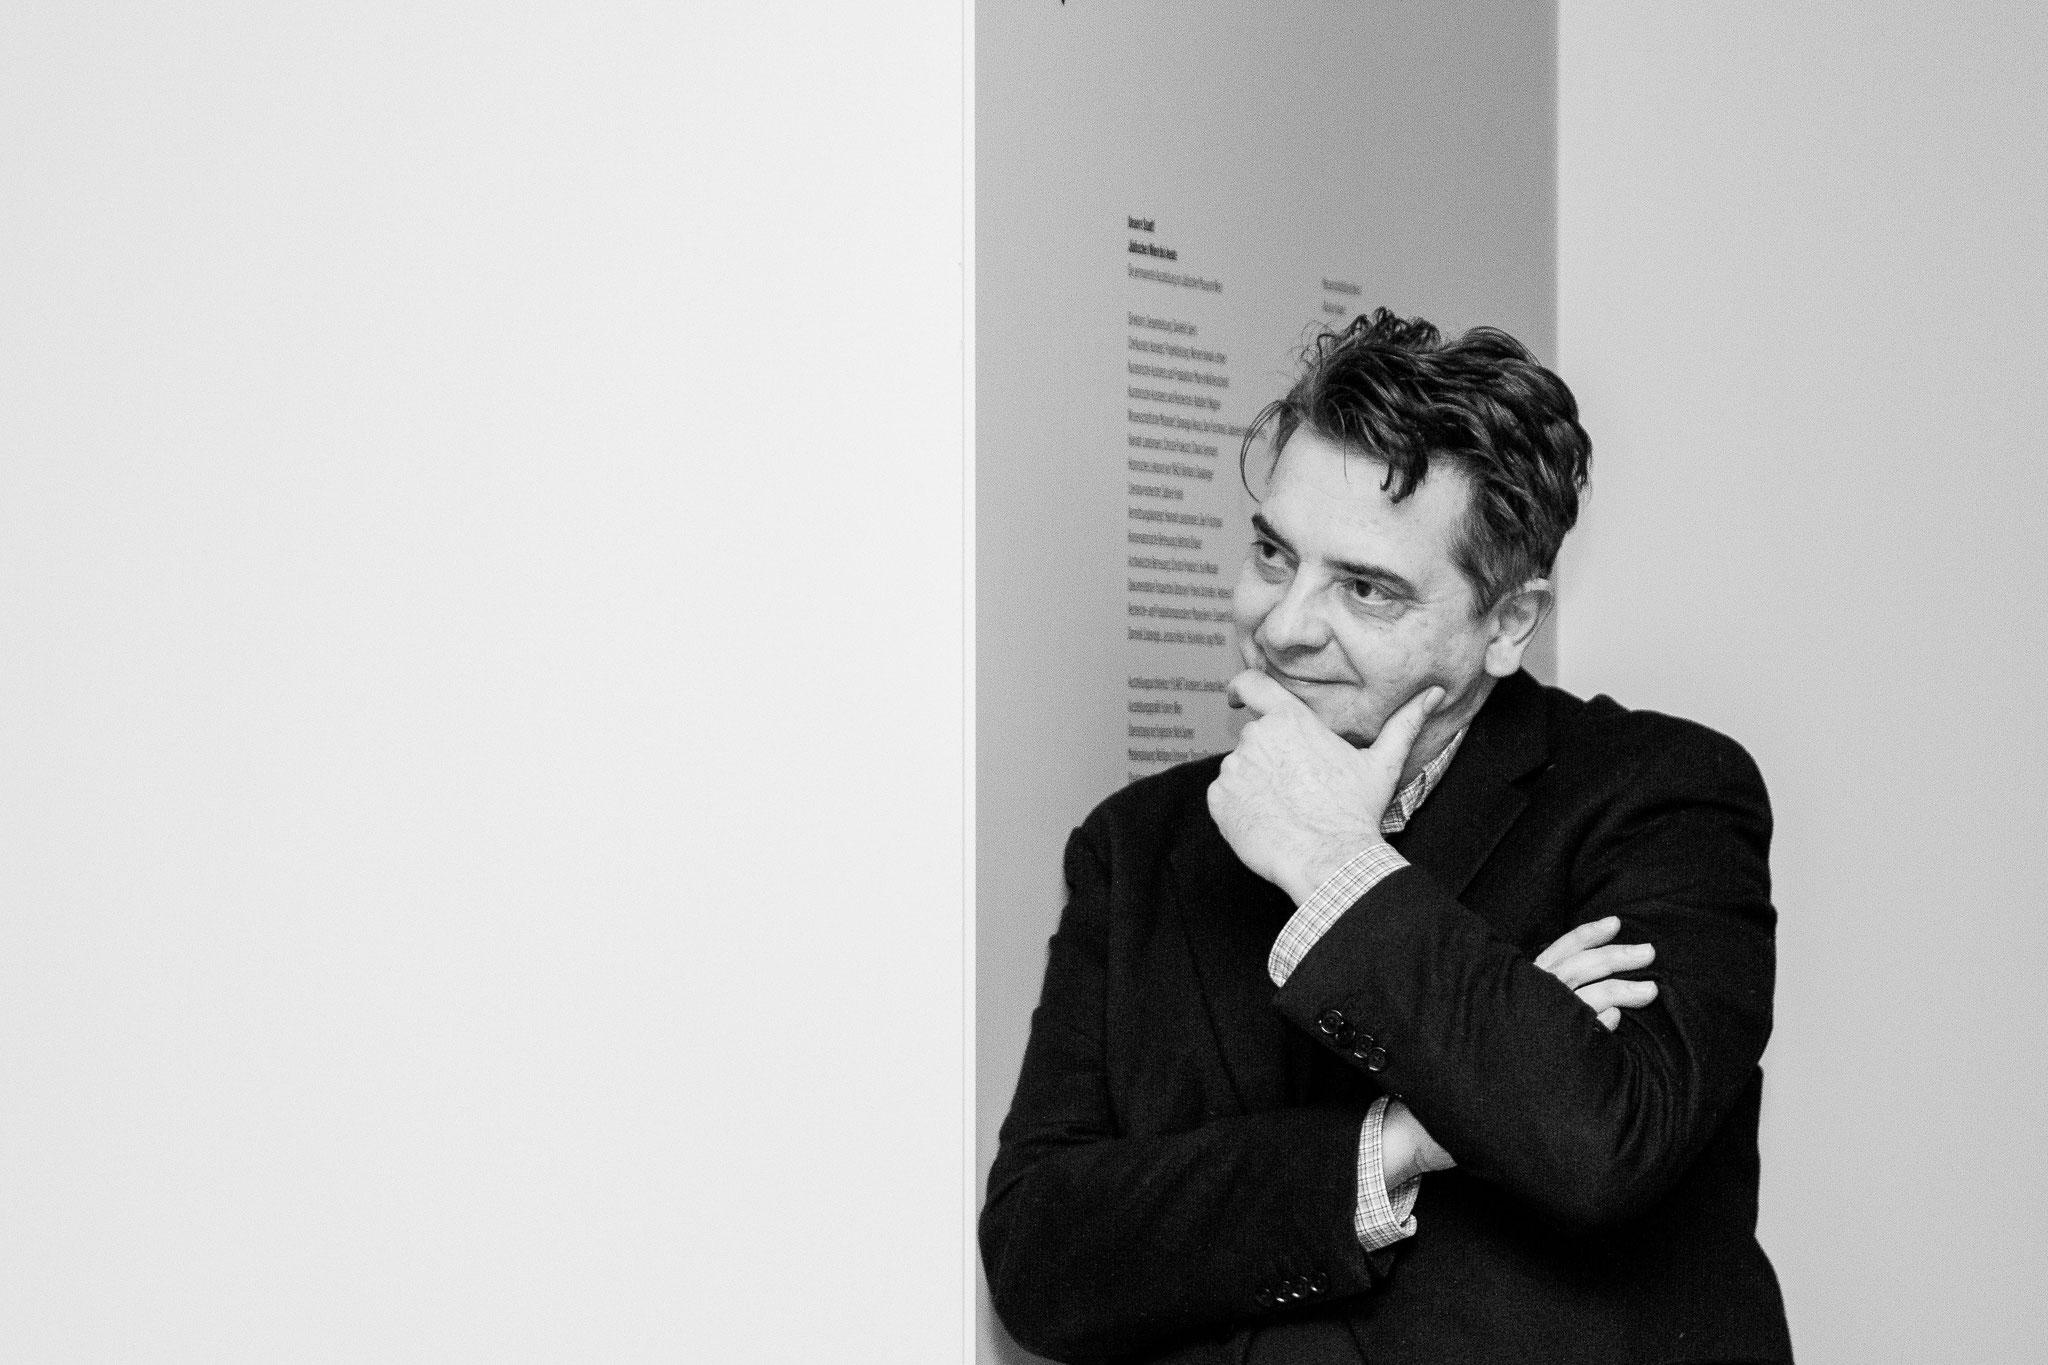 Christoph Wagner-Trenkwitz